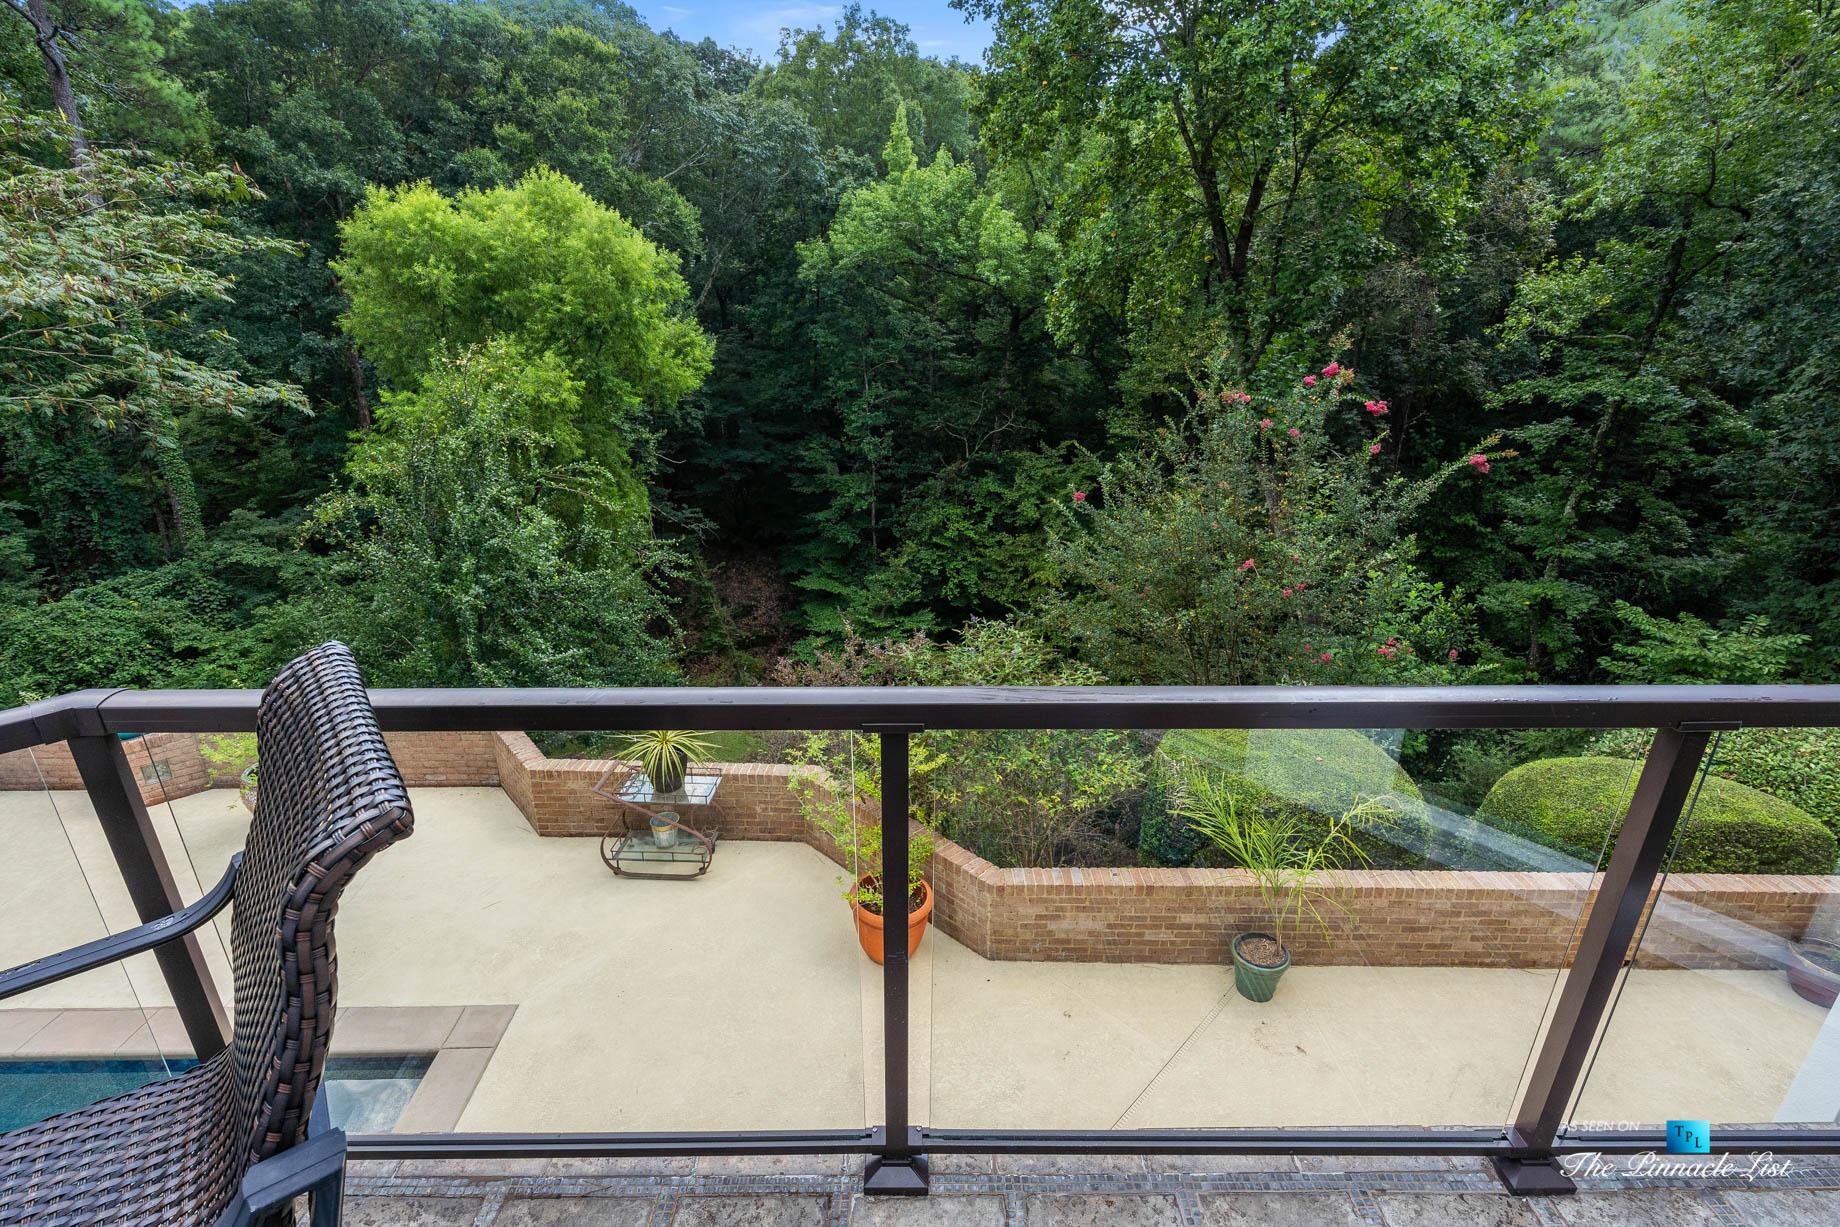 3906 Paces Ferry Rd NW, Atlanta, GA, USA - Balcony Overlooking Backyard Pool Deck - Luxury Real Estate - Buckhead Home